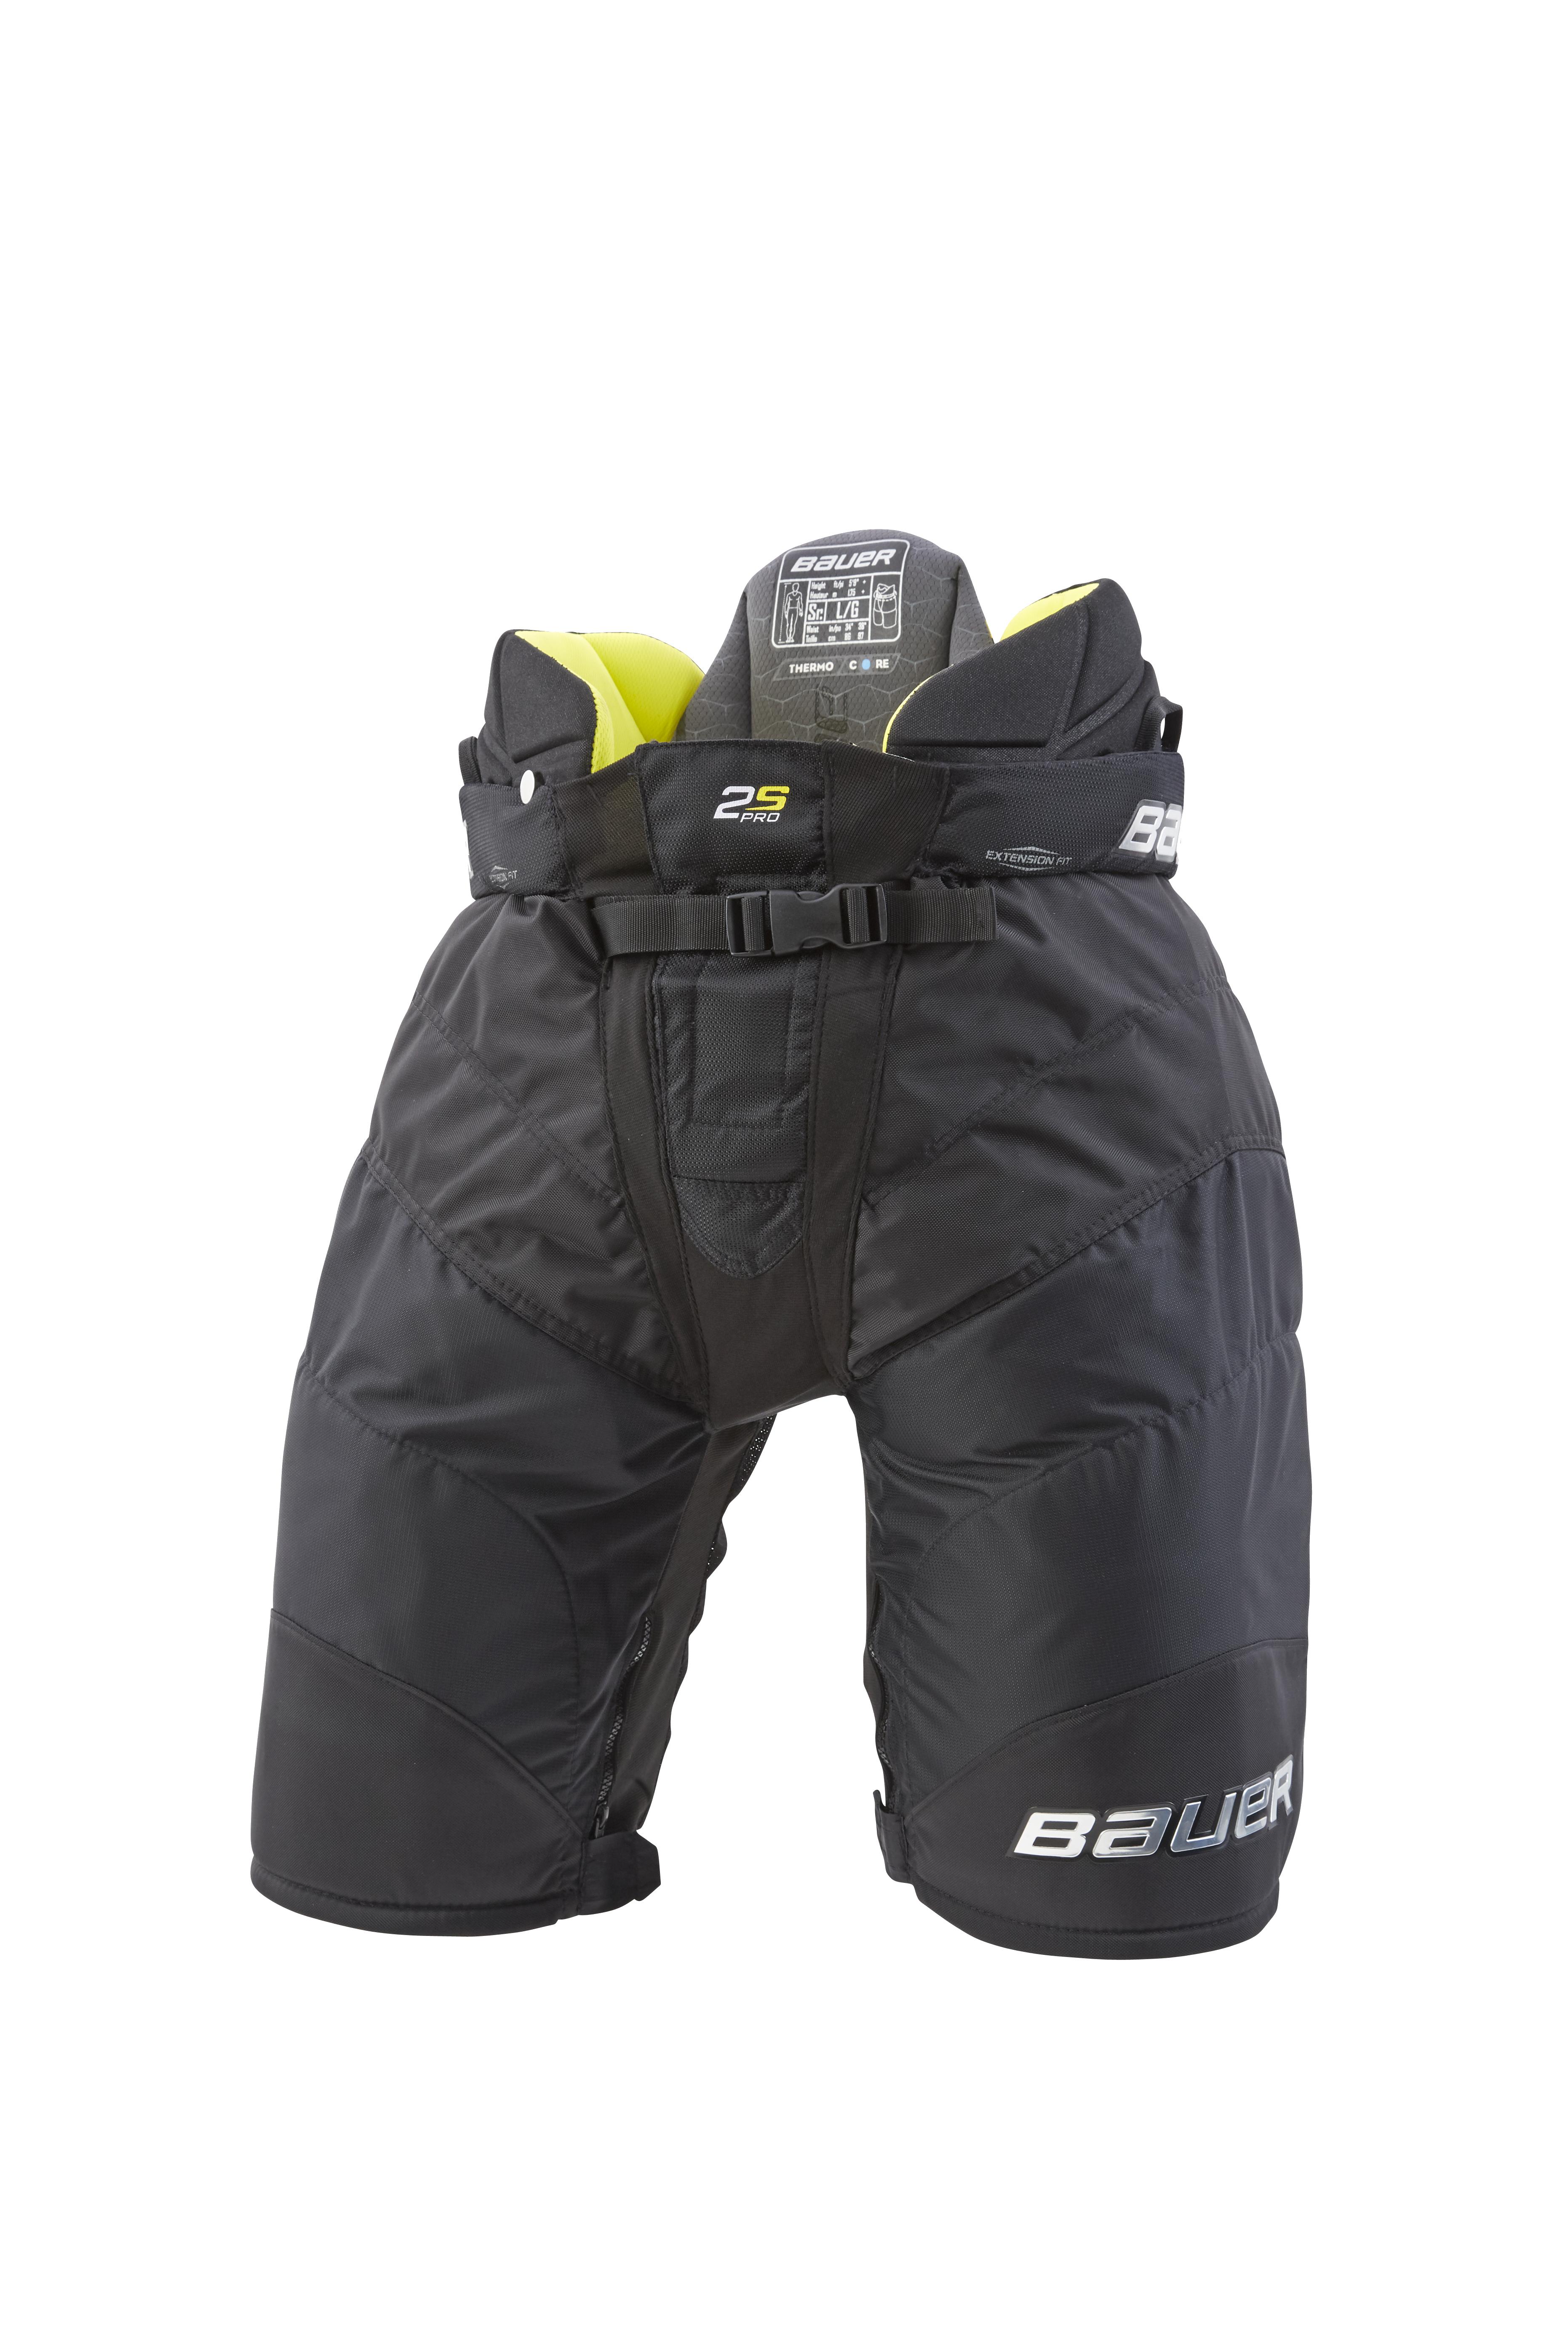 Hokejové nohavice Bauer Supreme 2S PRO Classic